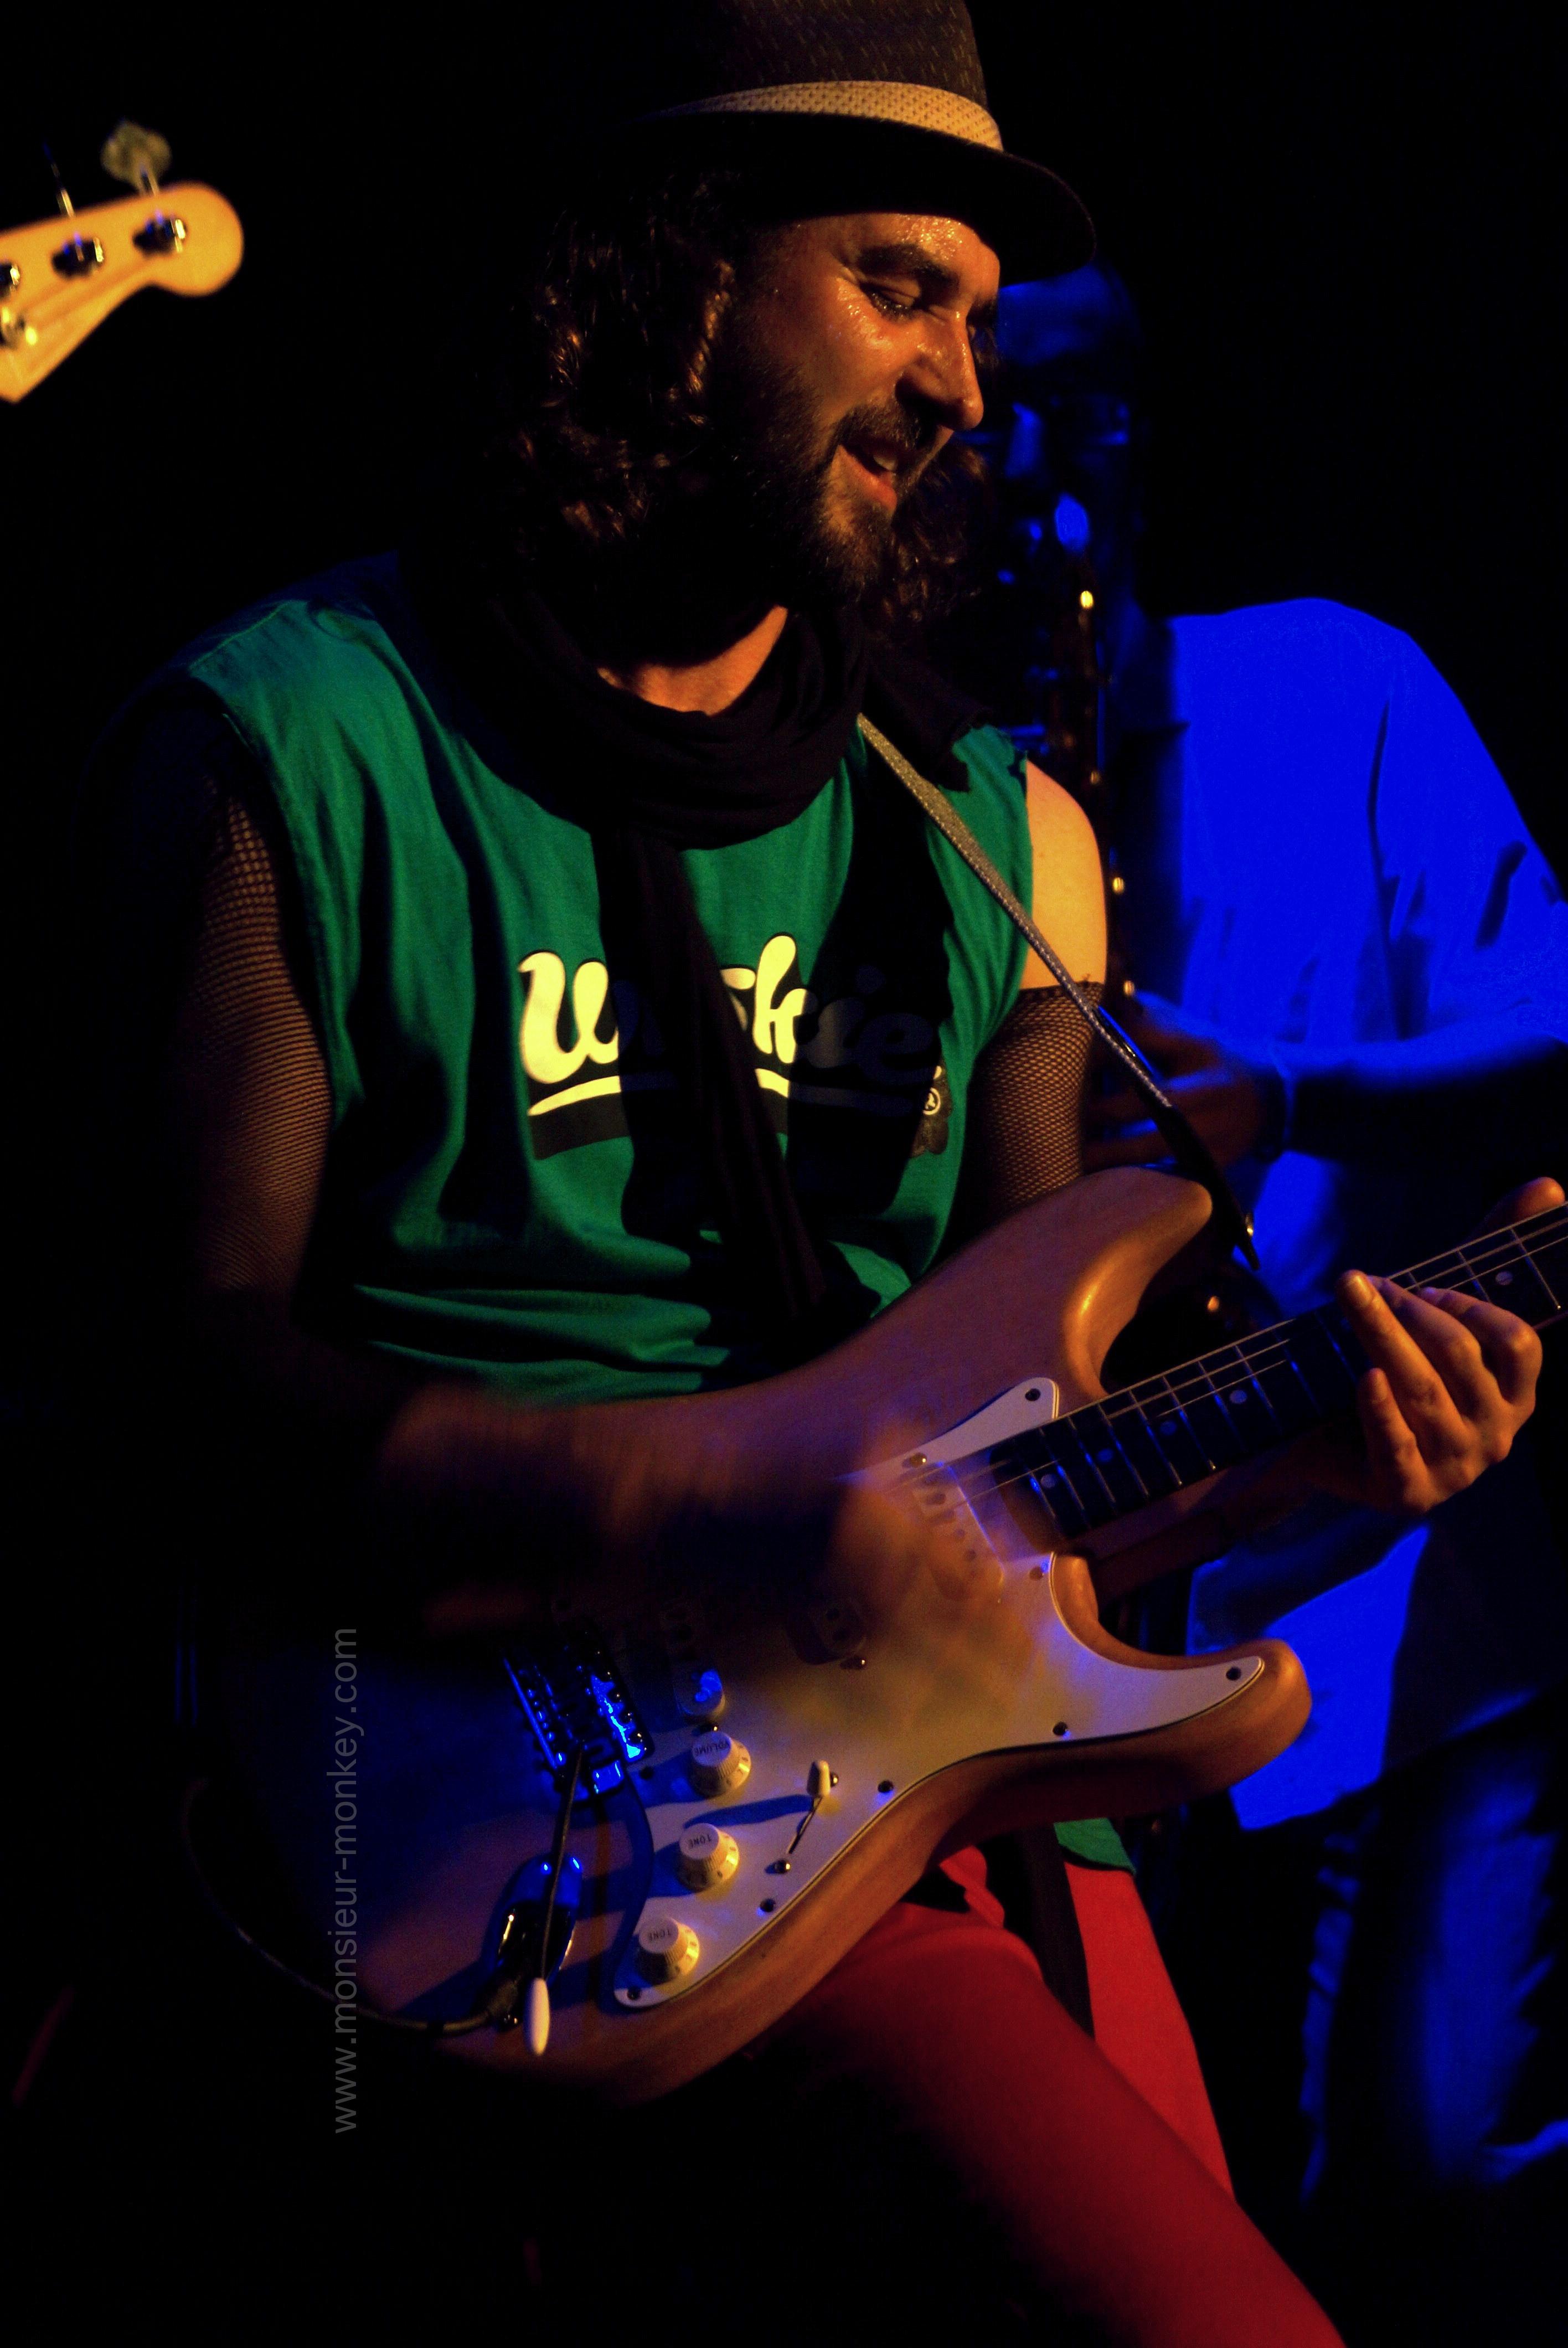 Guitar player live Barcelona